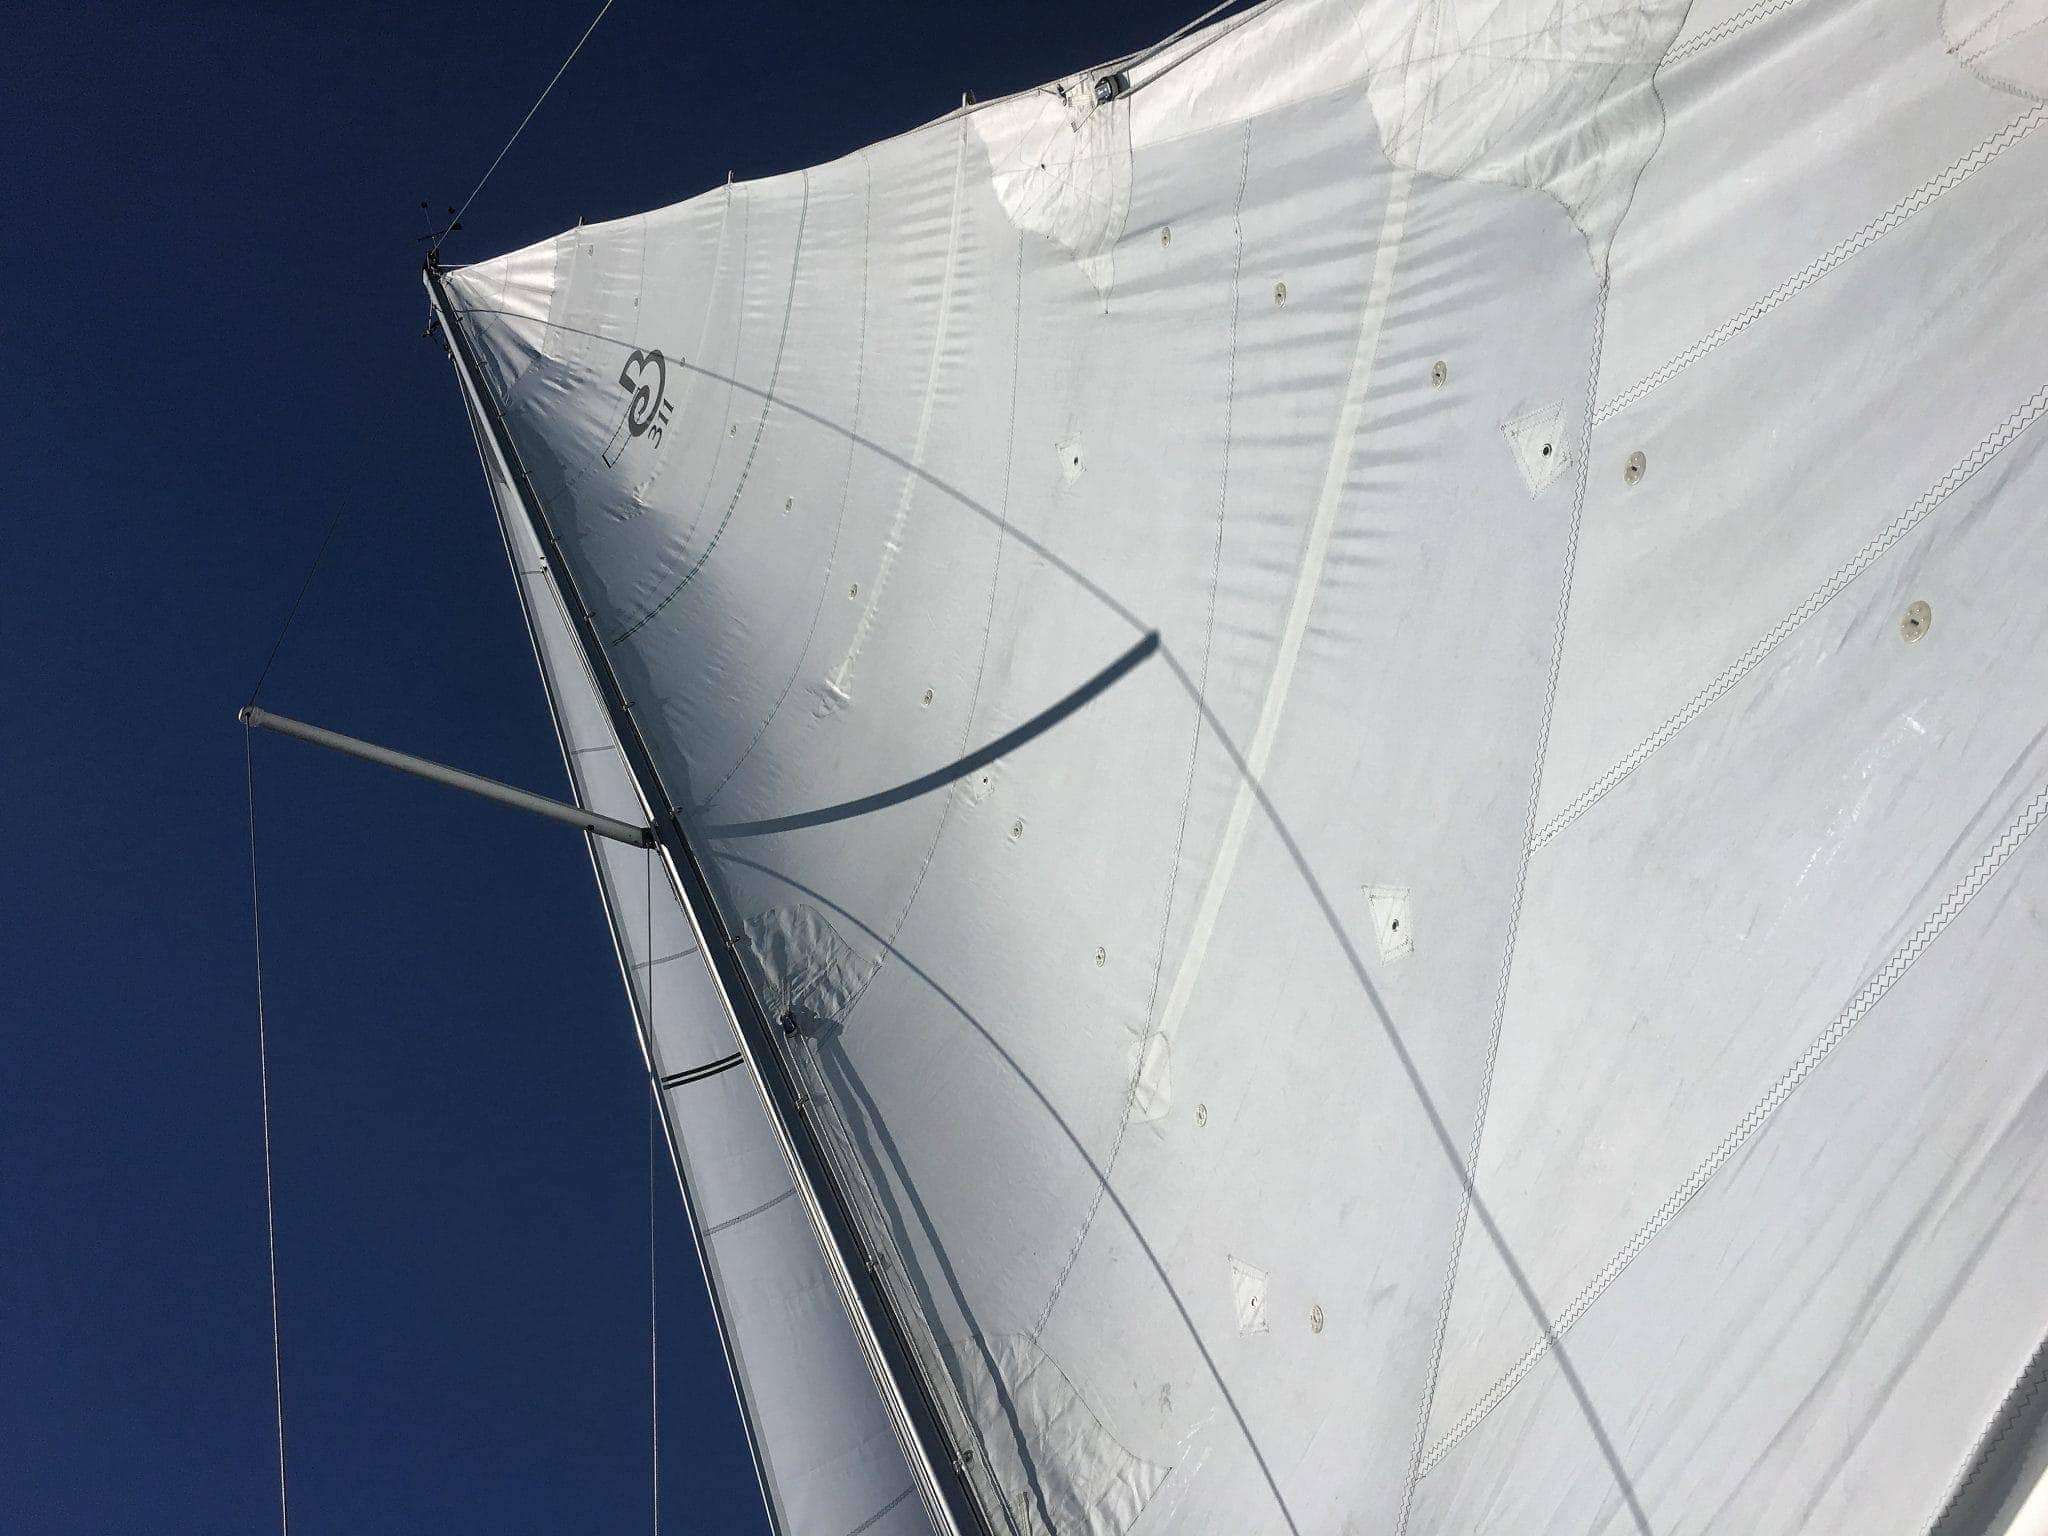 Grace's mainsail looking good